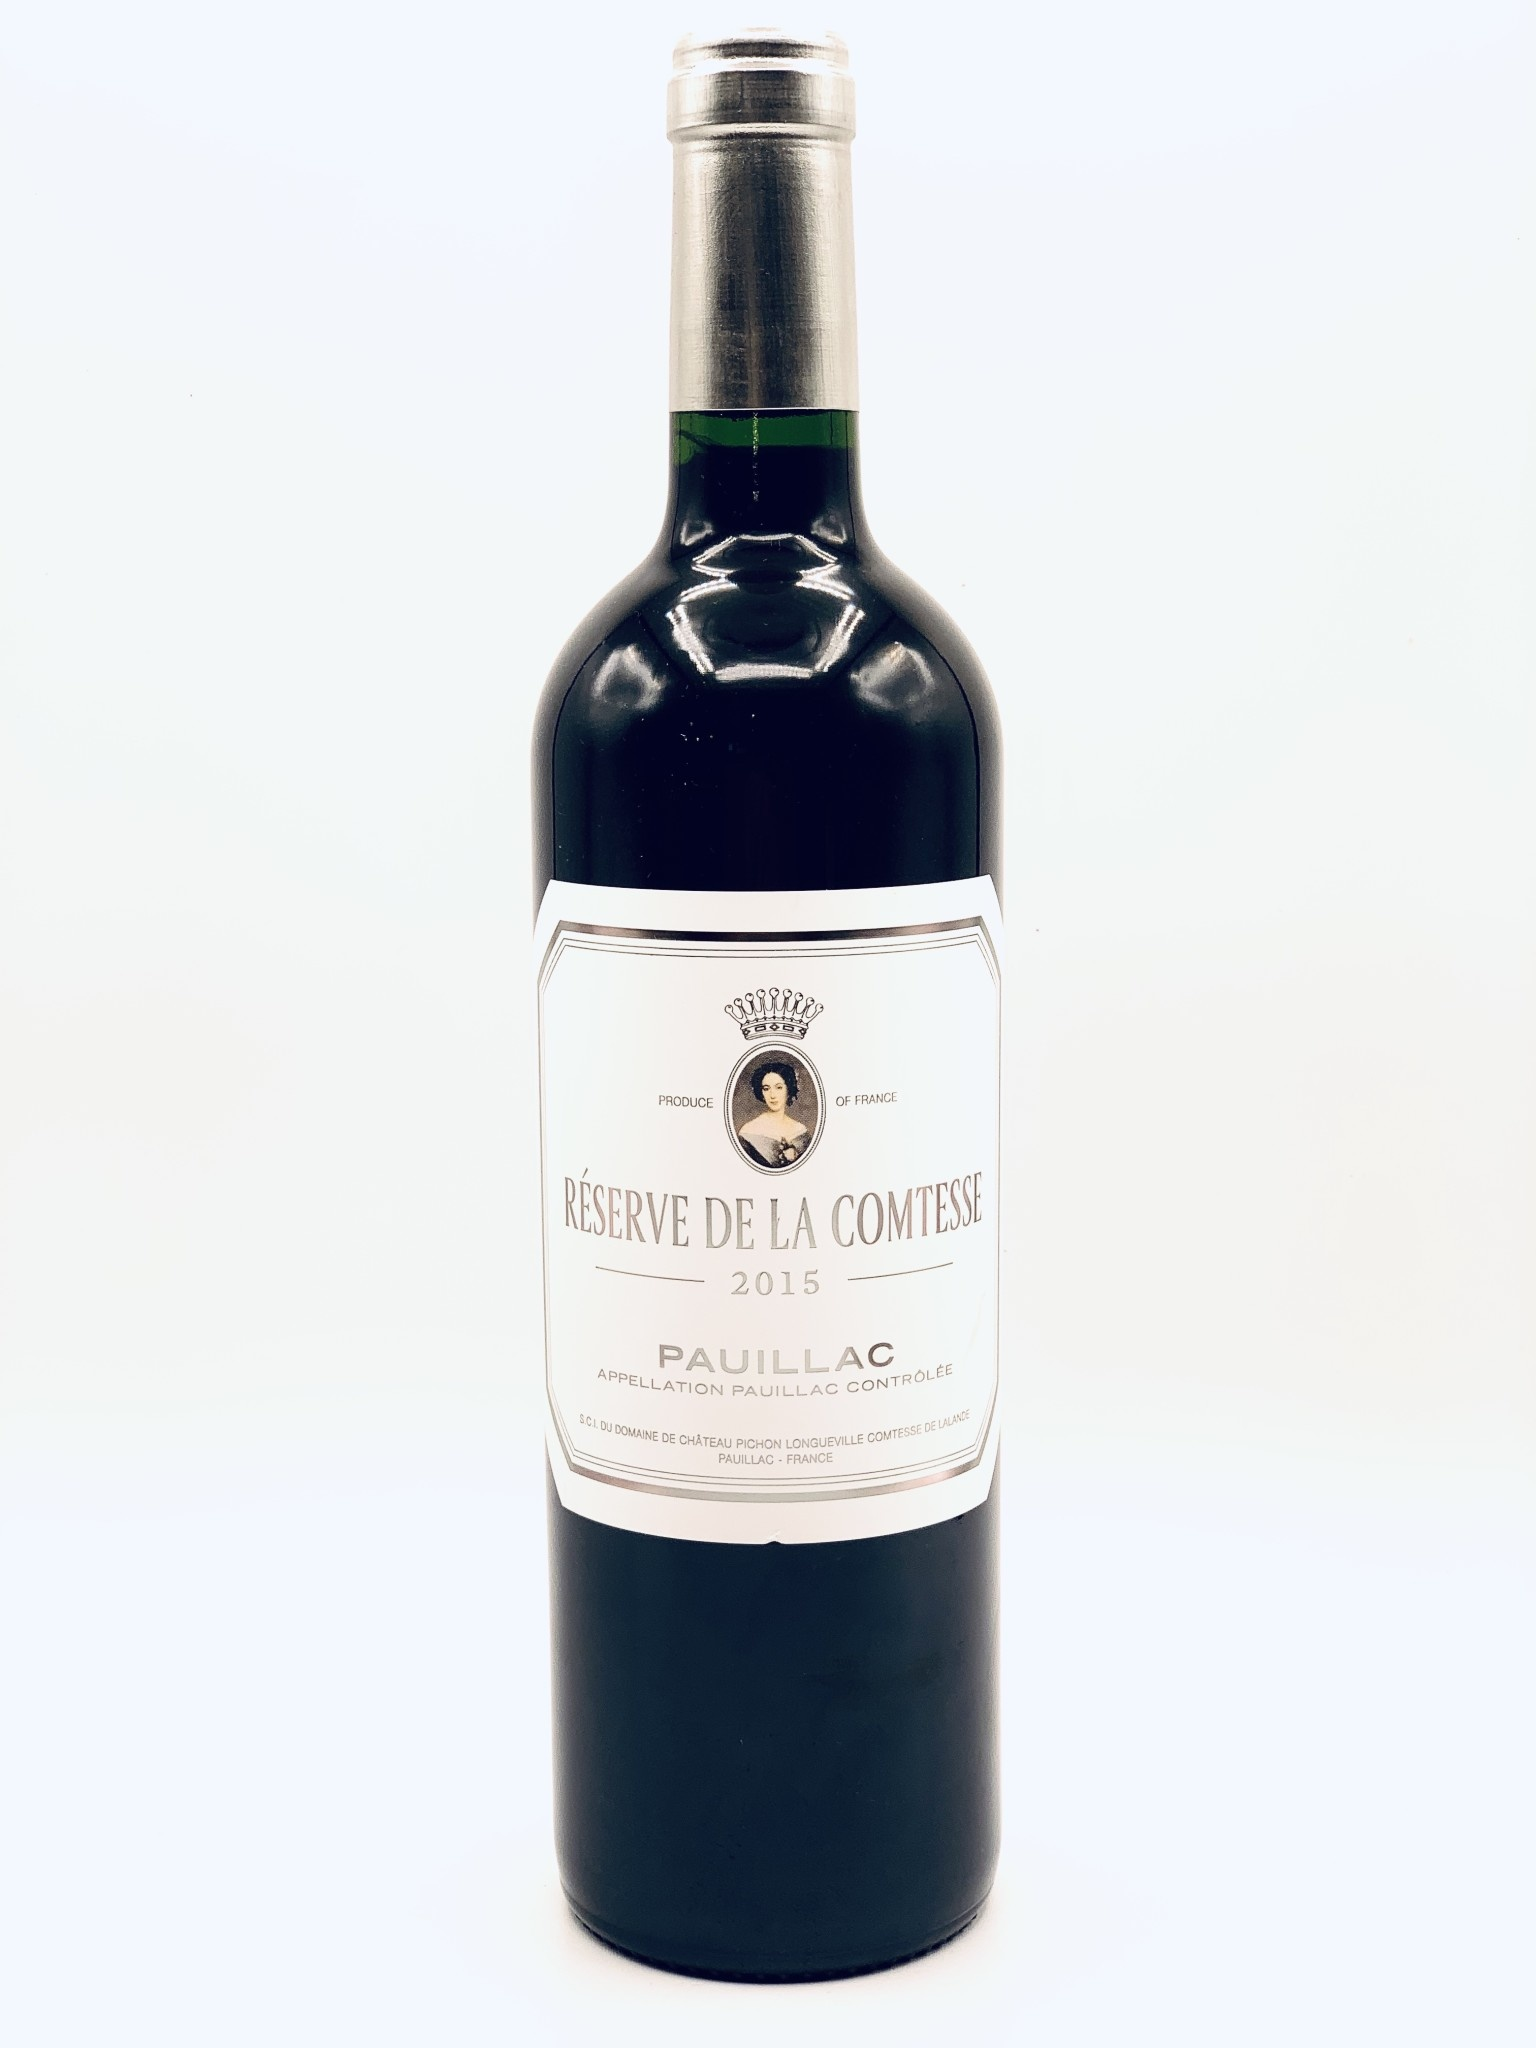 Pauillac 2015 Reserve de la Comtesse de Lalande